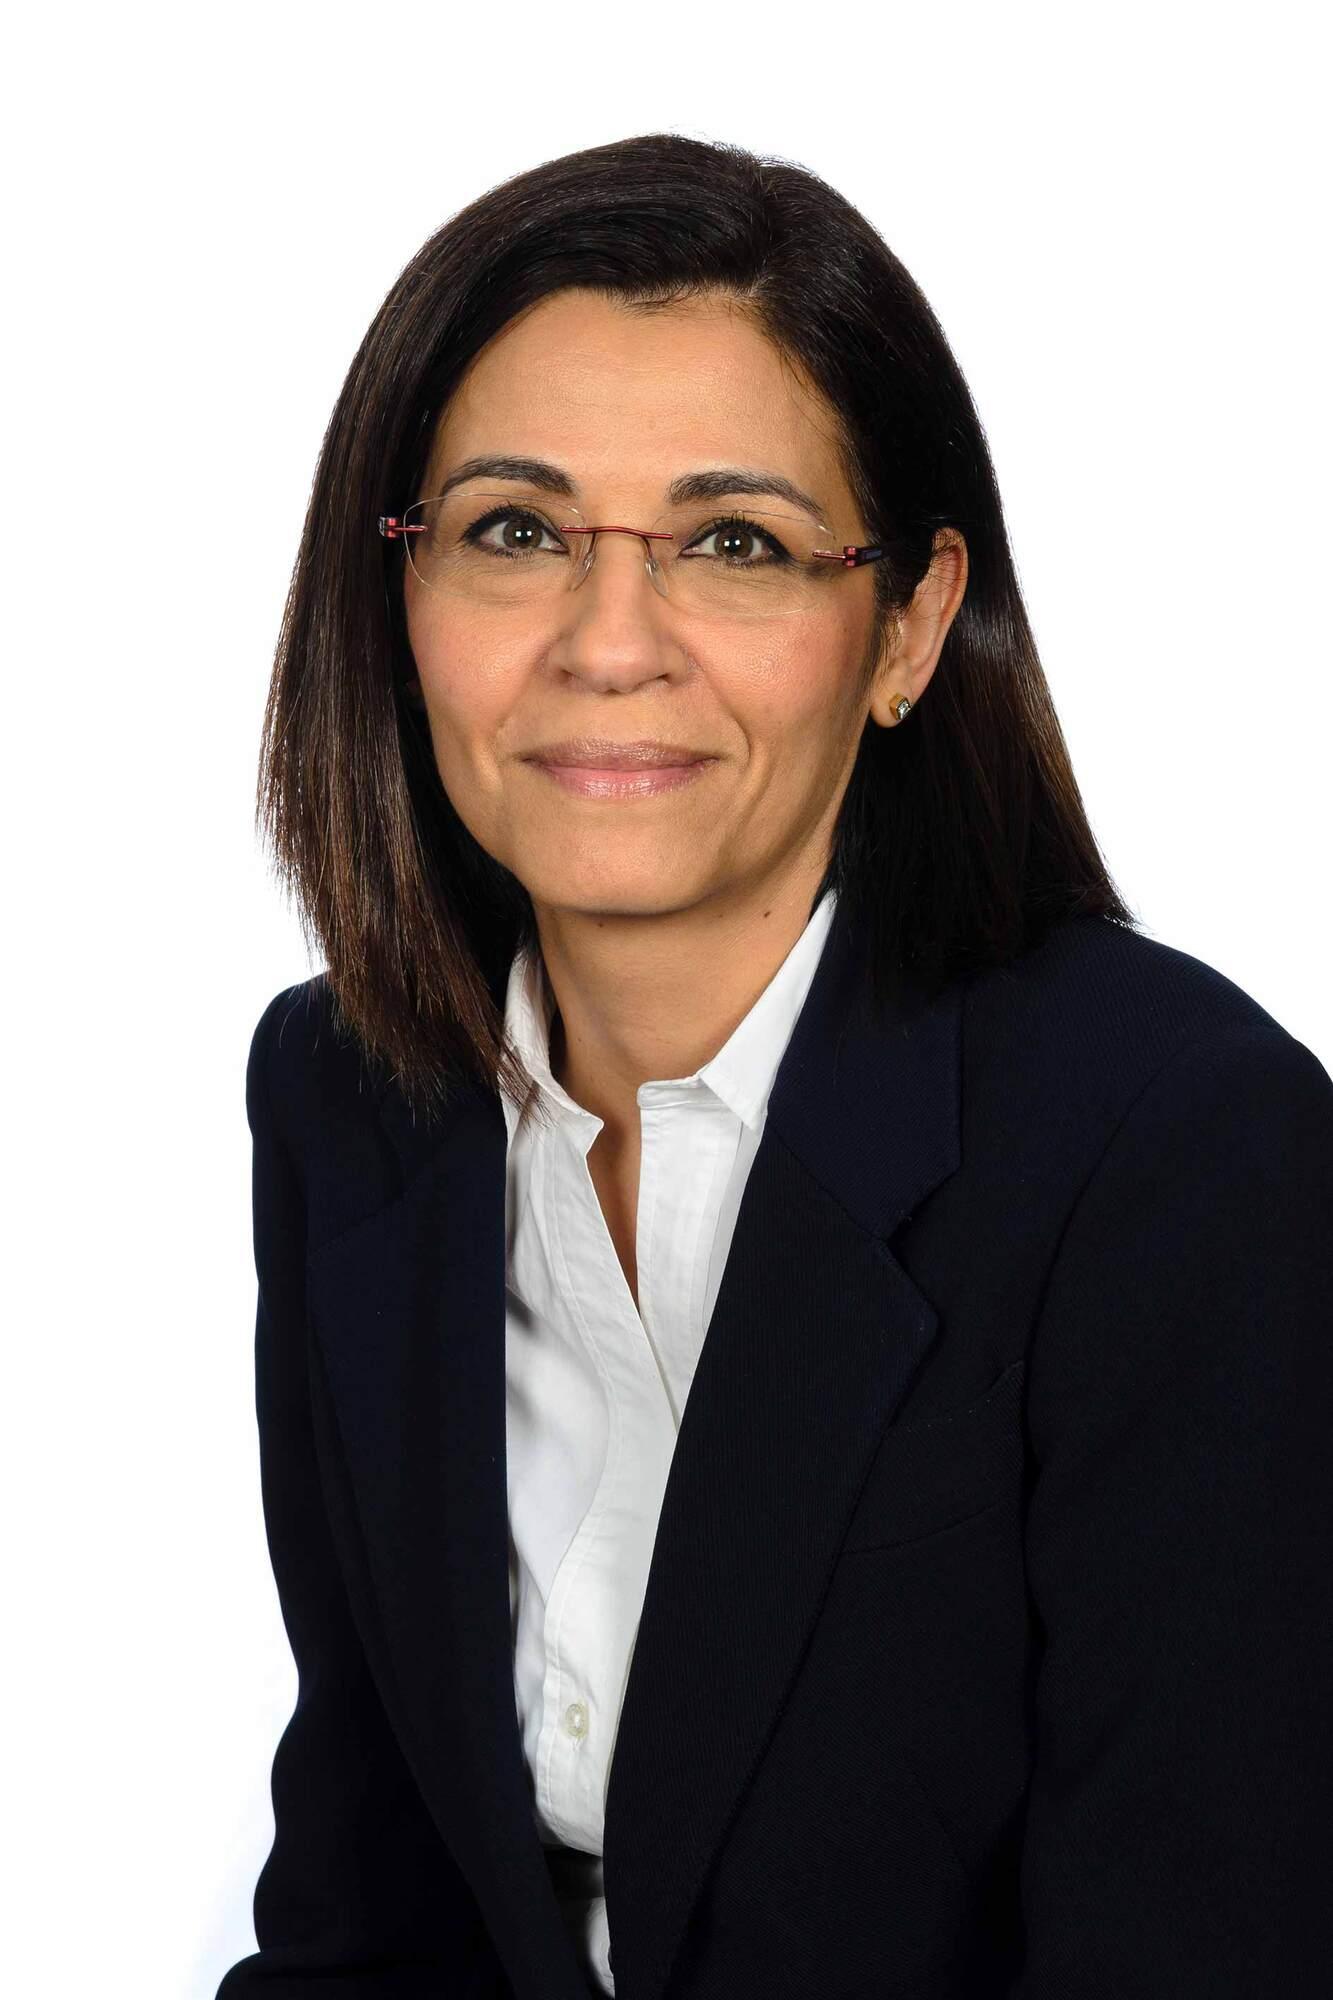 Carmen Moreno Ojeda